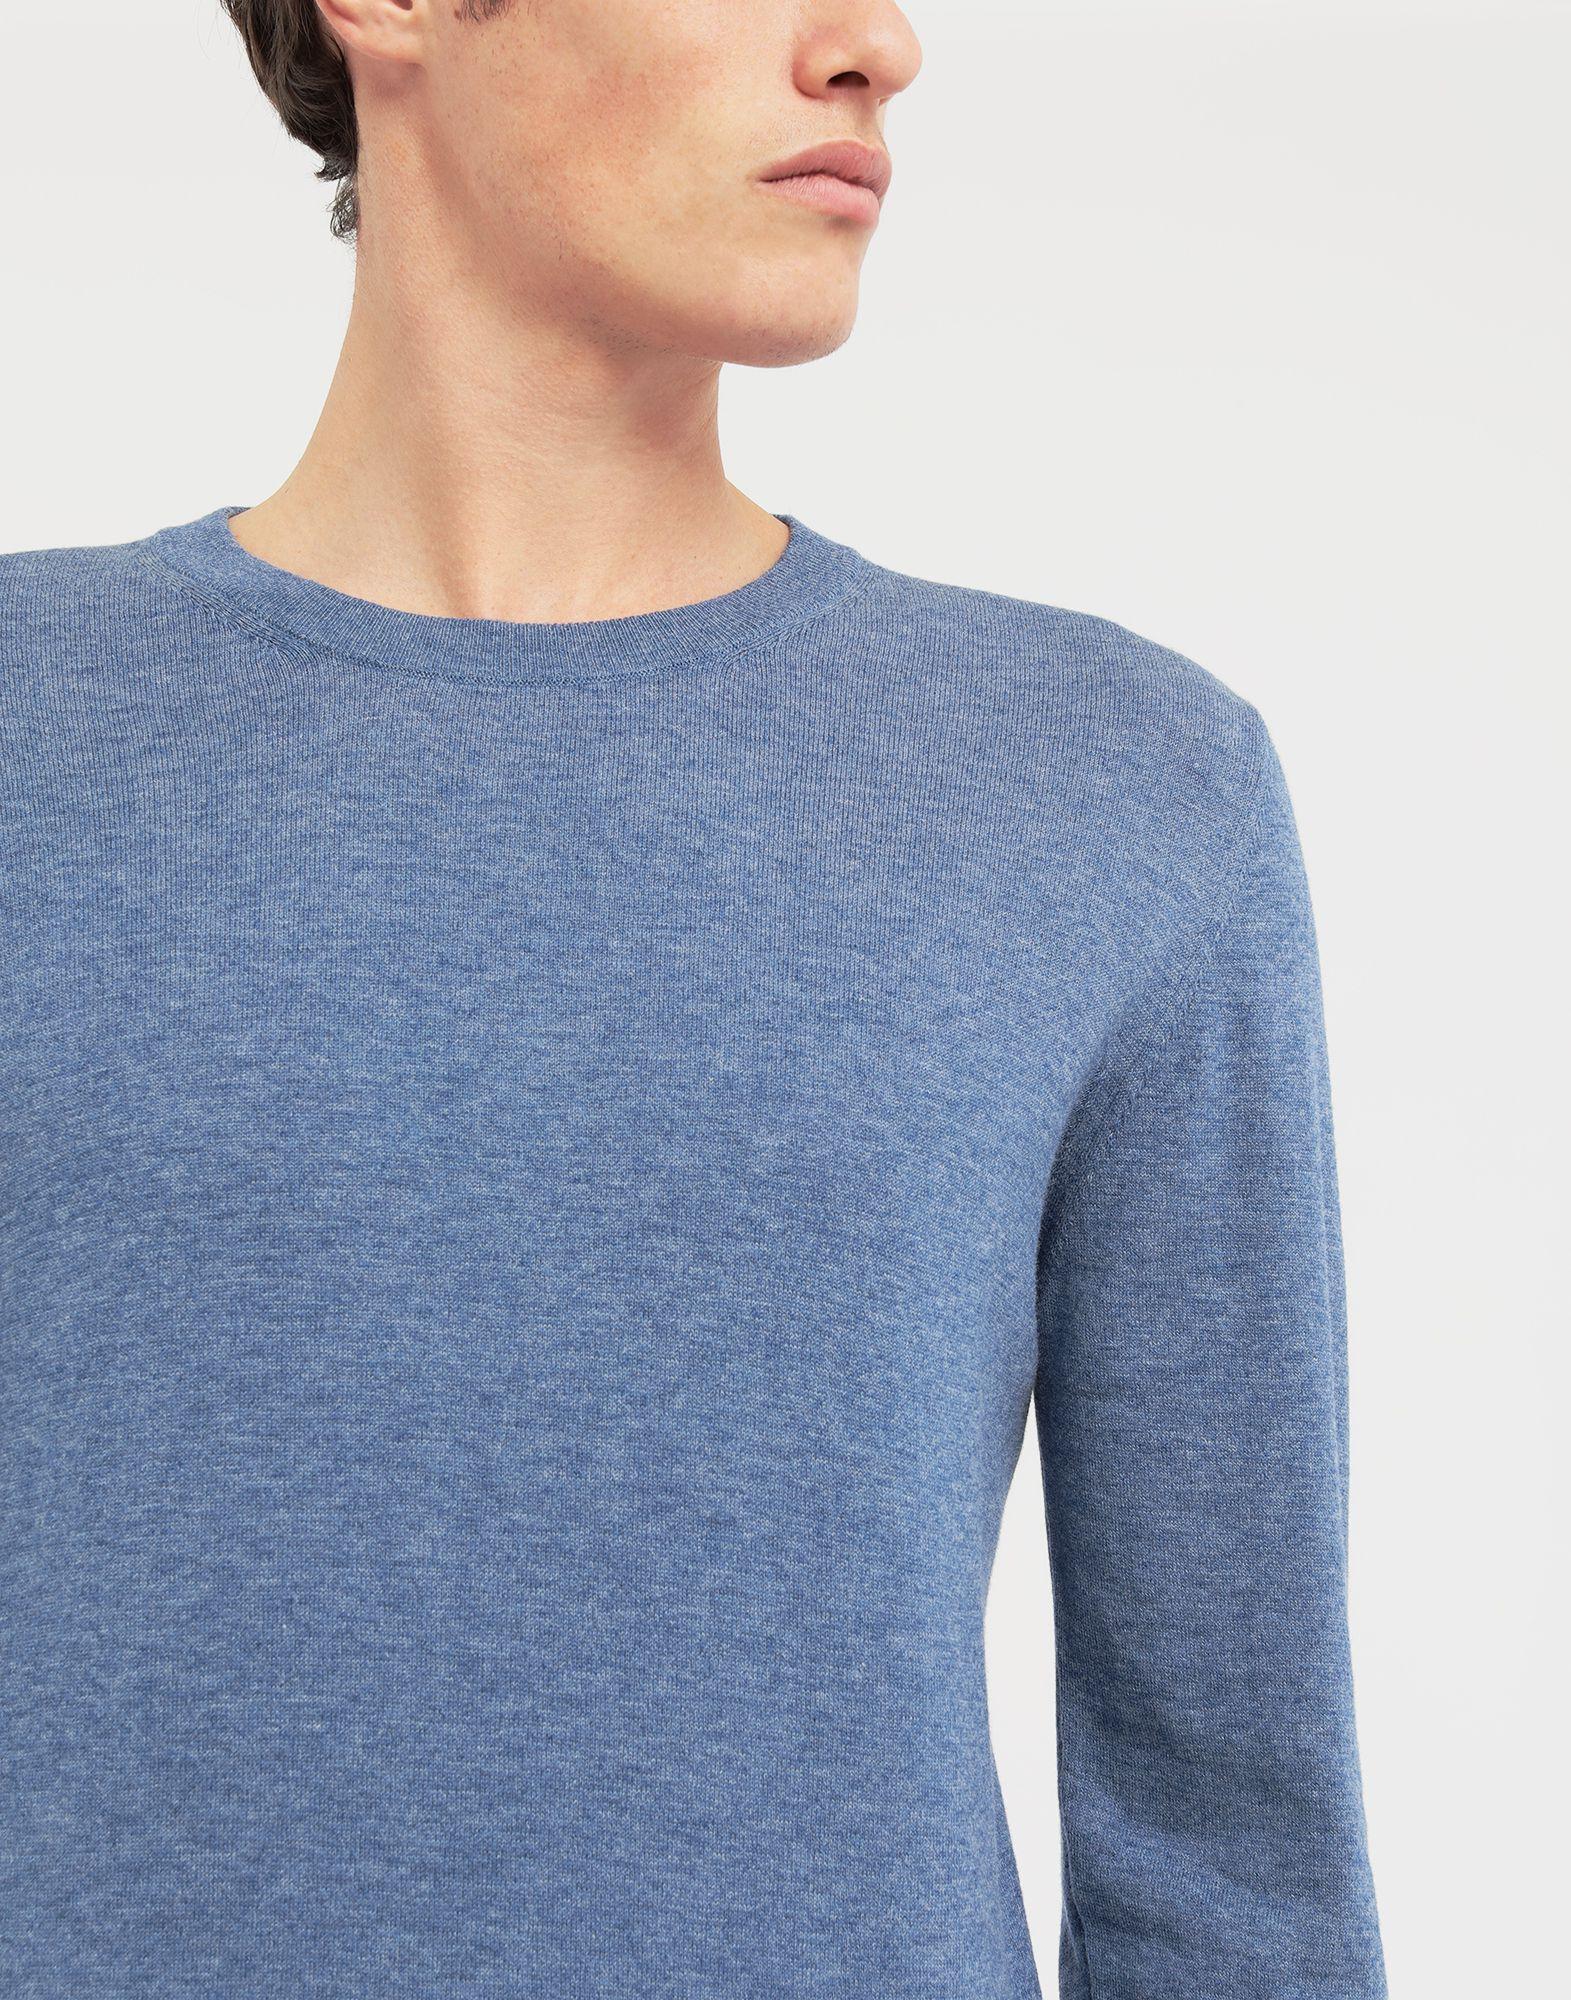 MAISON MARGIELA Décortiqué elbow patch knit pullover Long sleeve sweater Man a